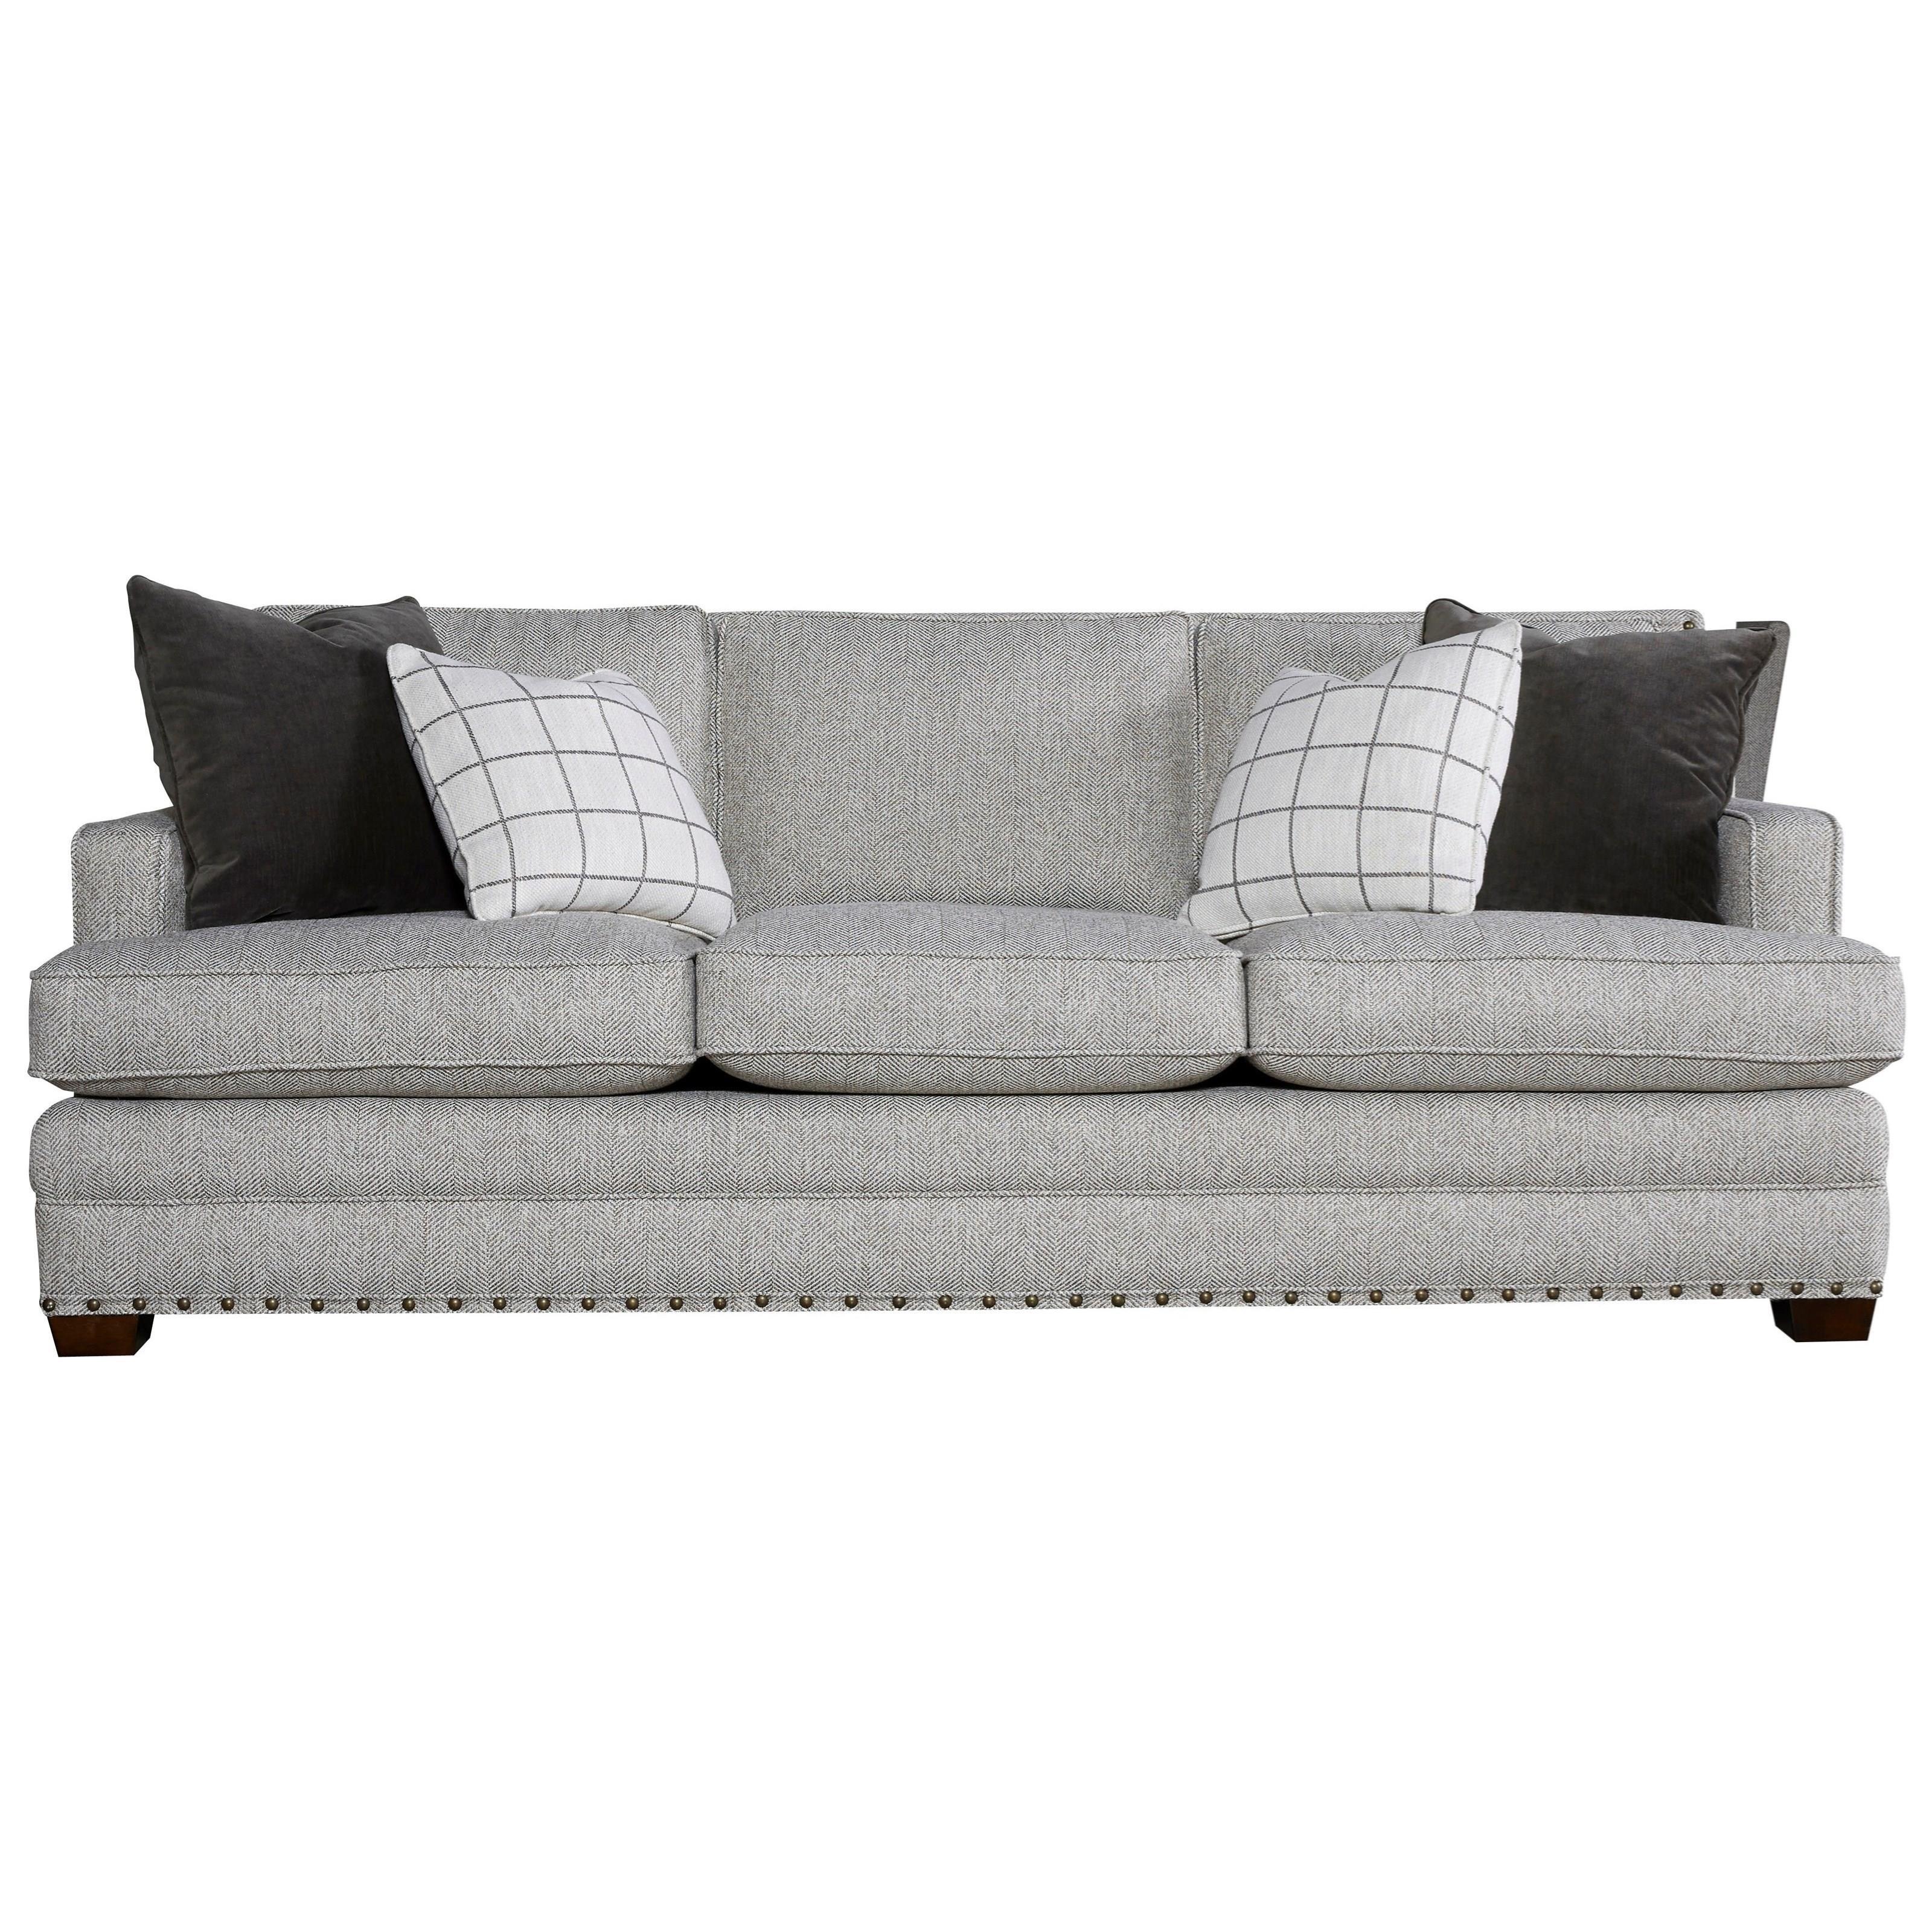 Riley Sofa by Universal at Belfort Furniture